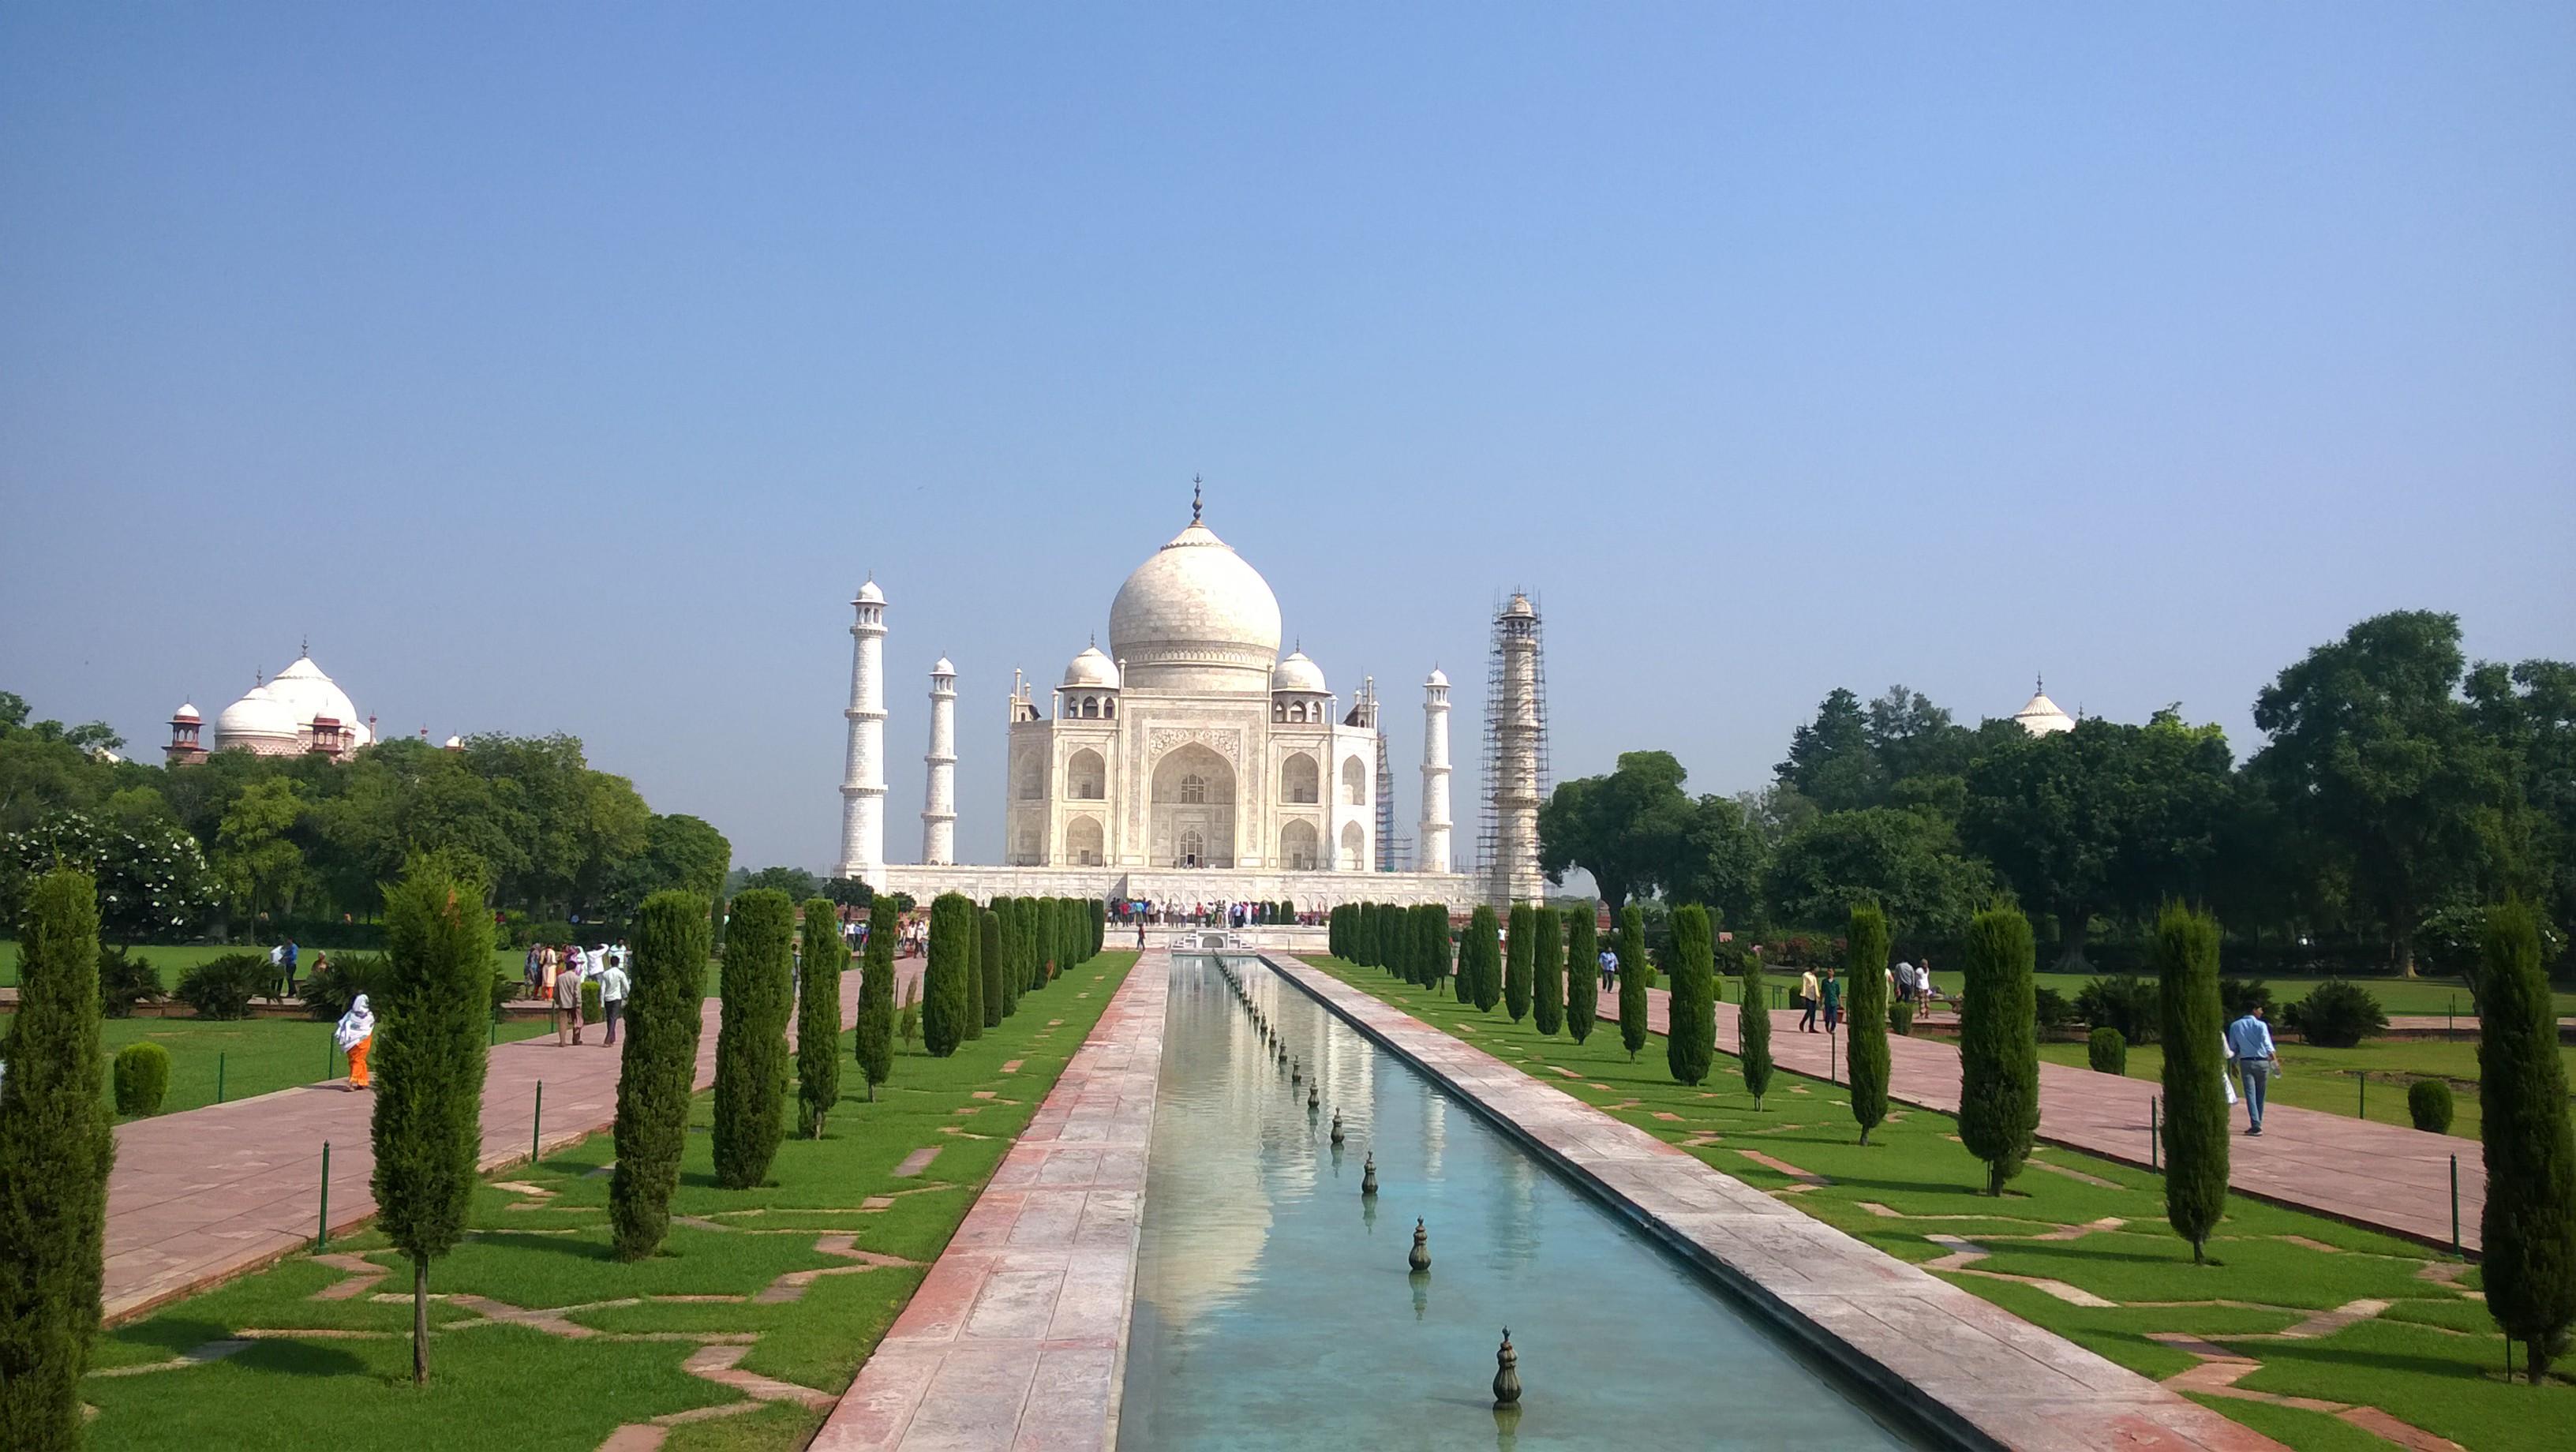 HQ Taj Mahal Wallpapers | File 1030.37Kb